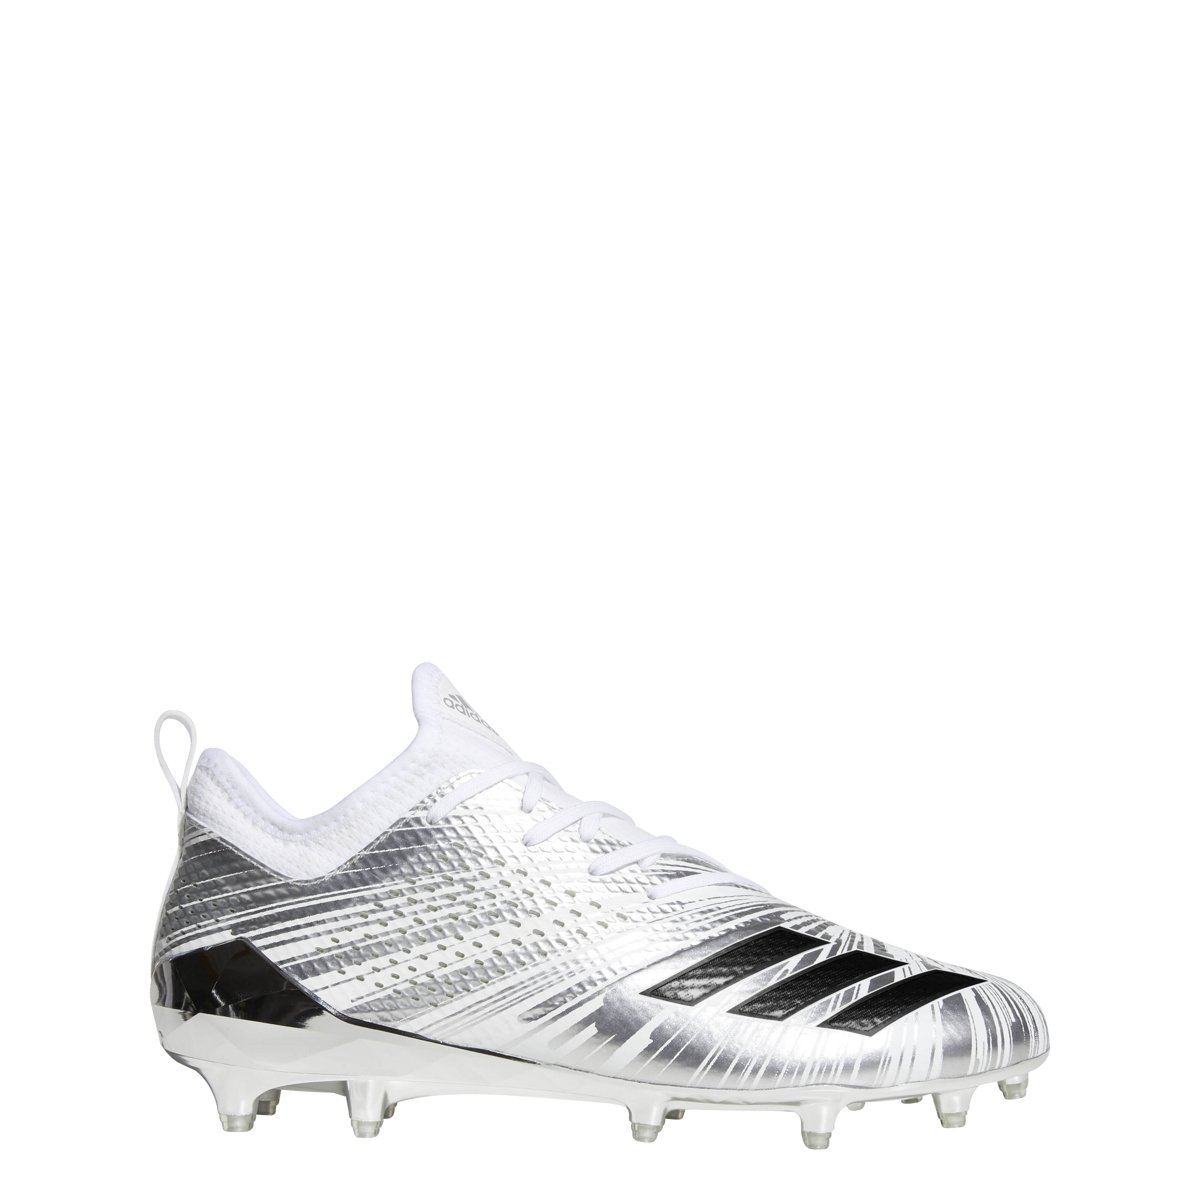 adidas Men's Adizero 5-Star 7.0 Football Shoe B07B6FR3VB 9.5 D(M) US Silver Metallic-core Black-white